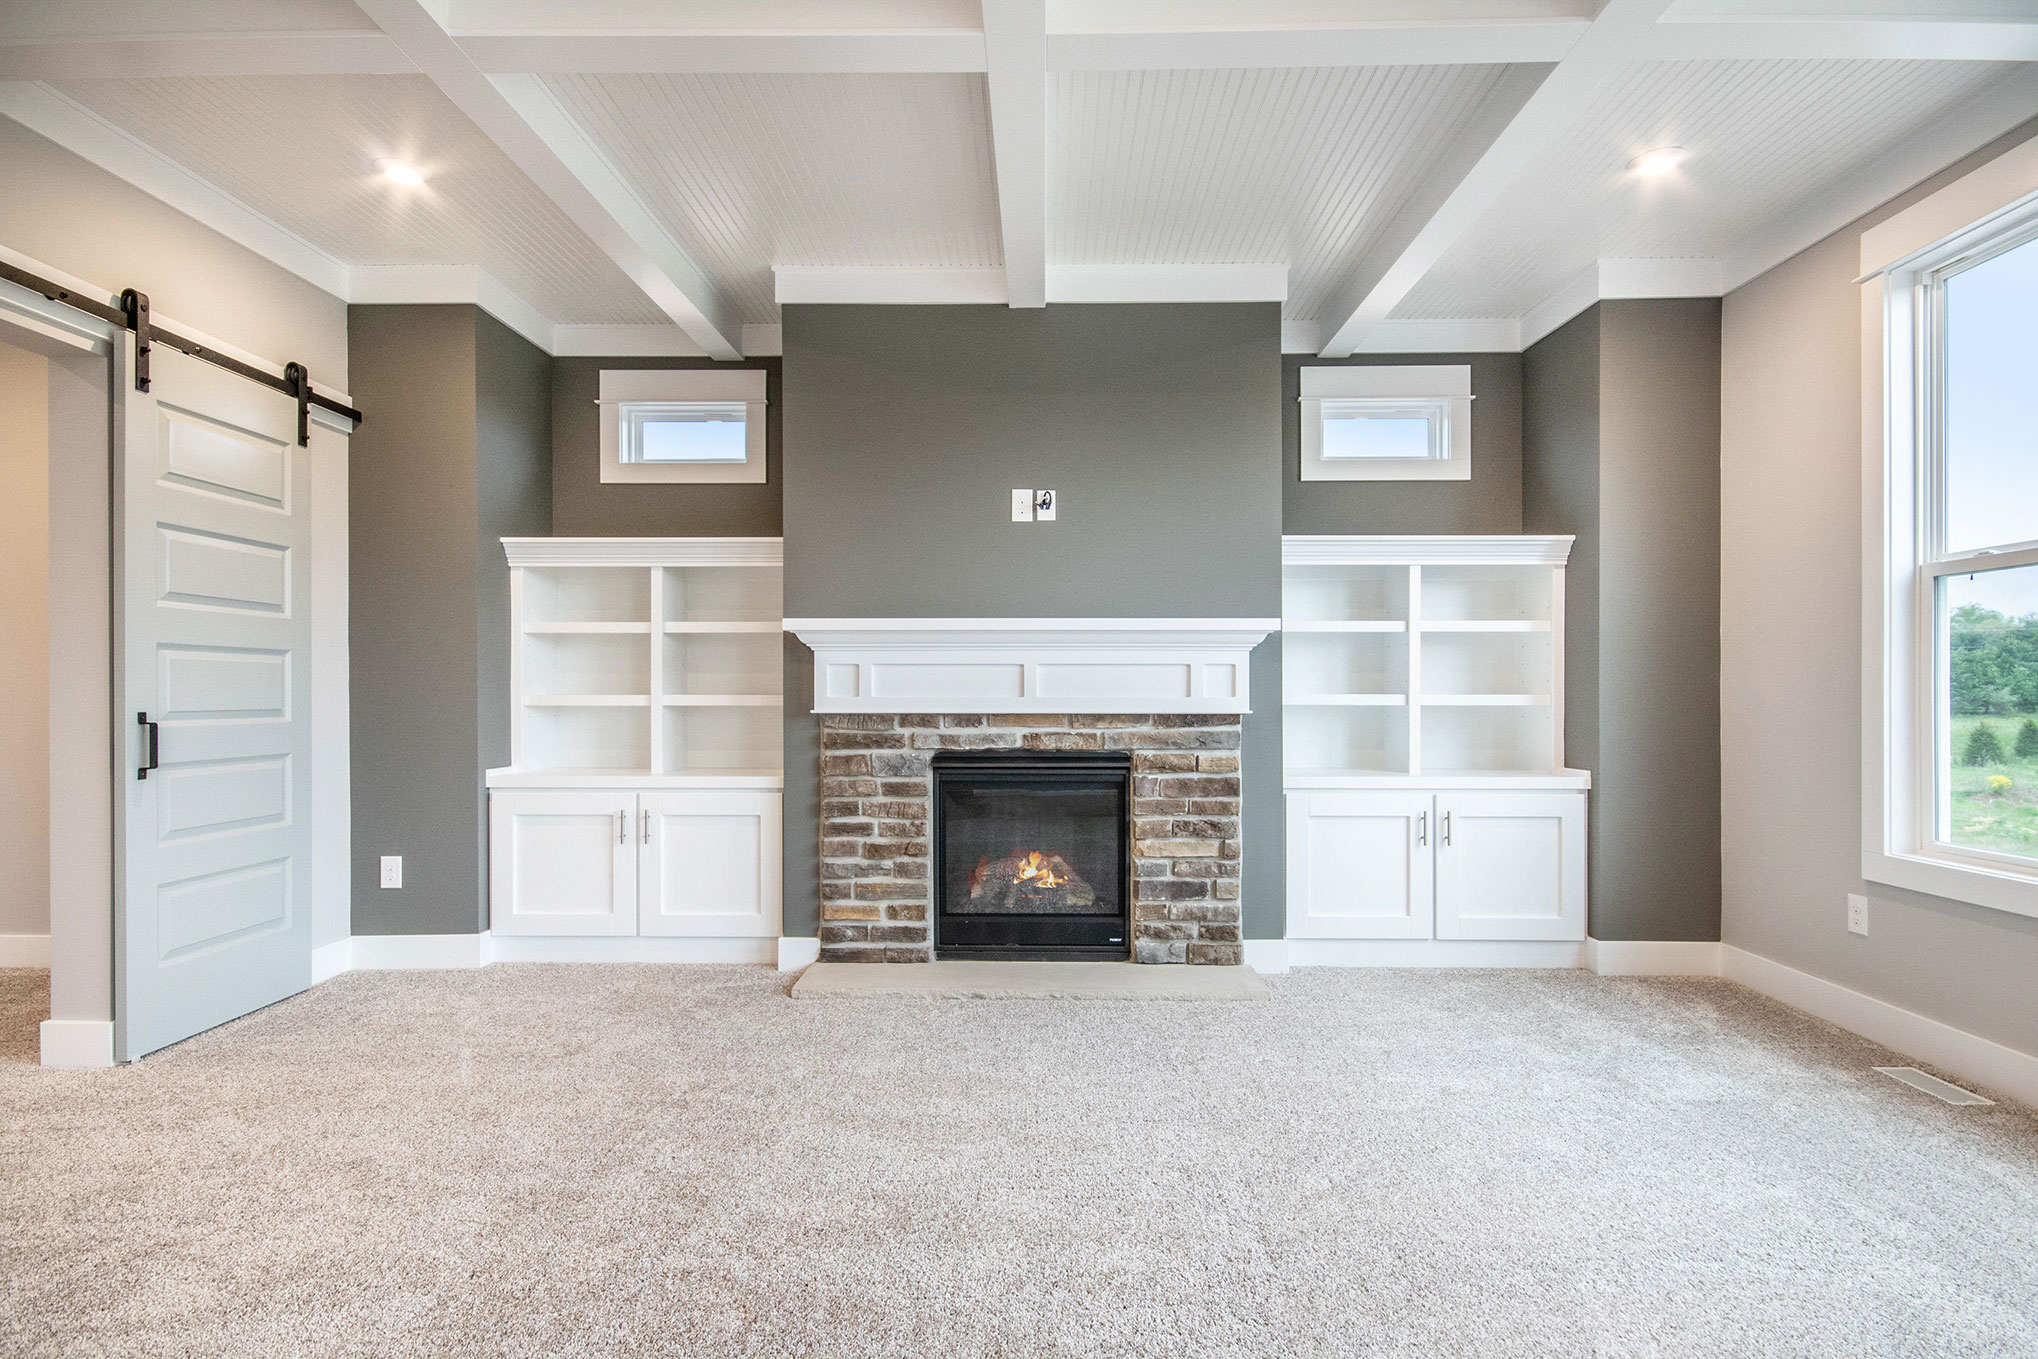 Custom Floor Plans - The Crestview - Harvest-Meadows-HRVM22-2528b-Crestview-1204-23-1